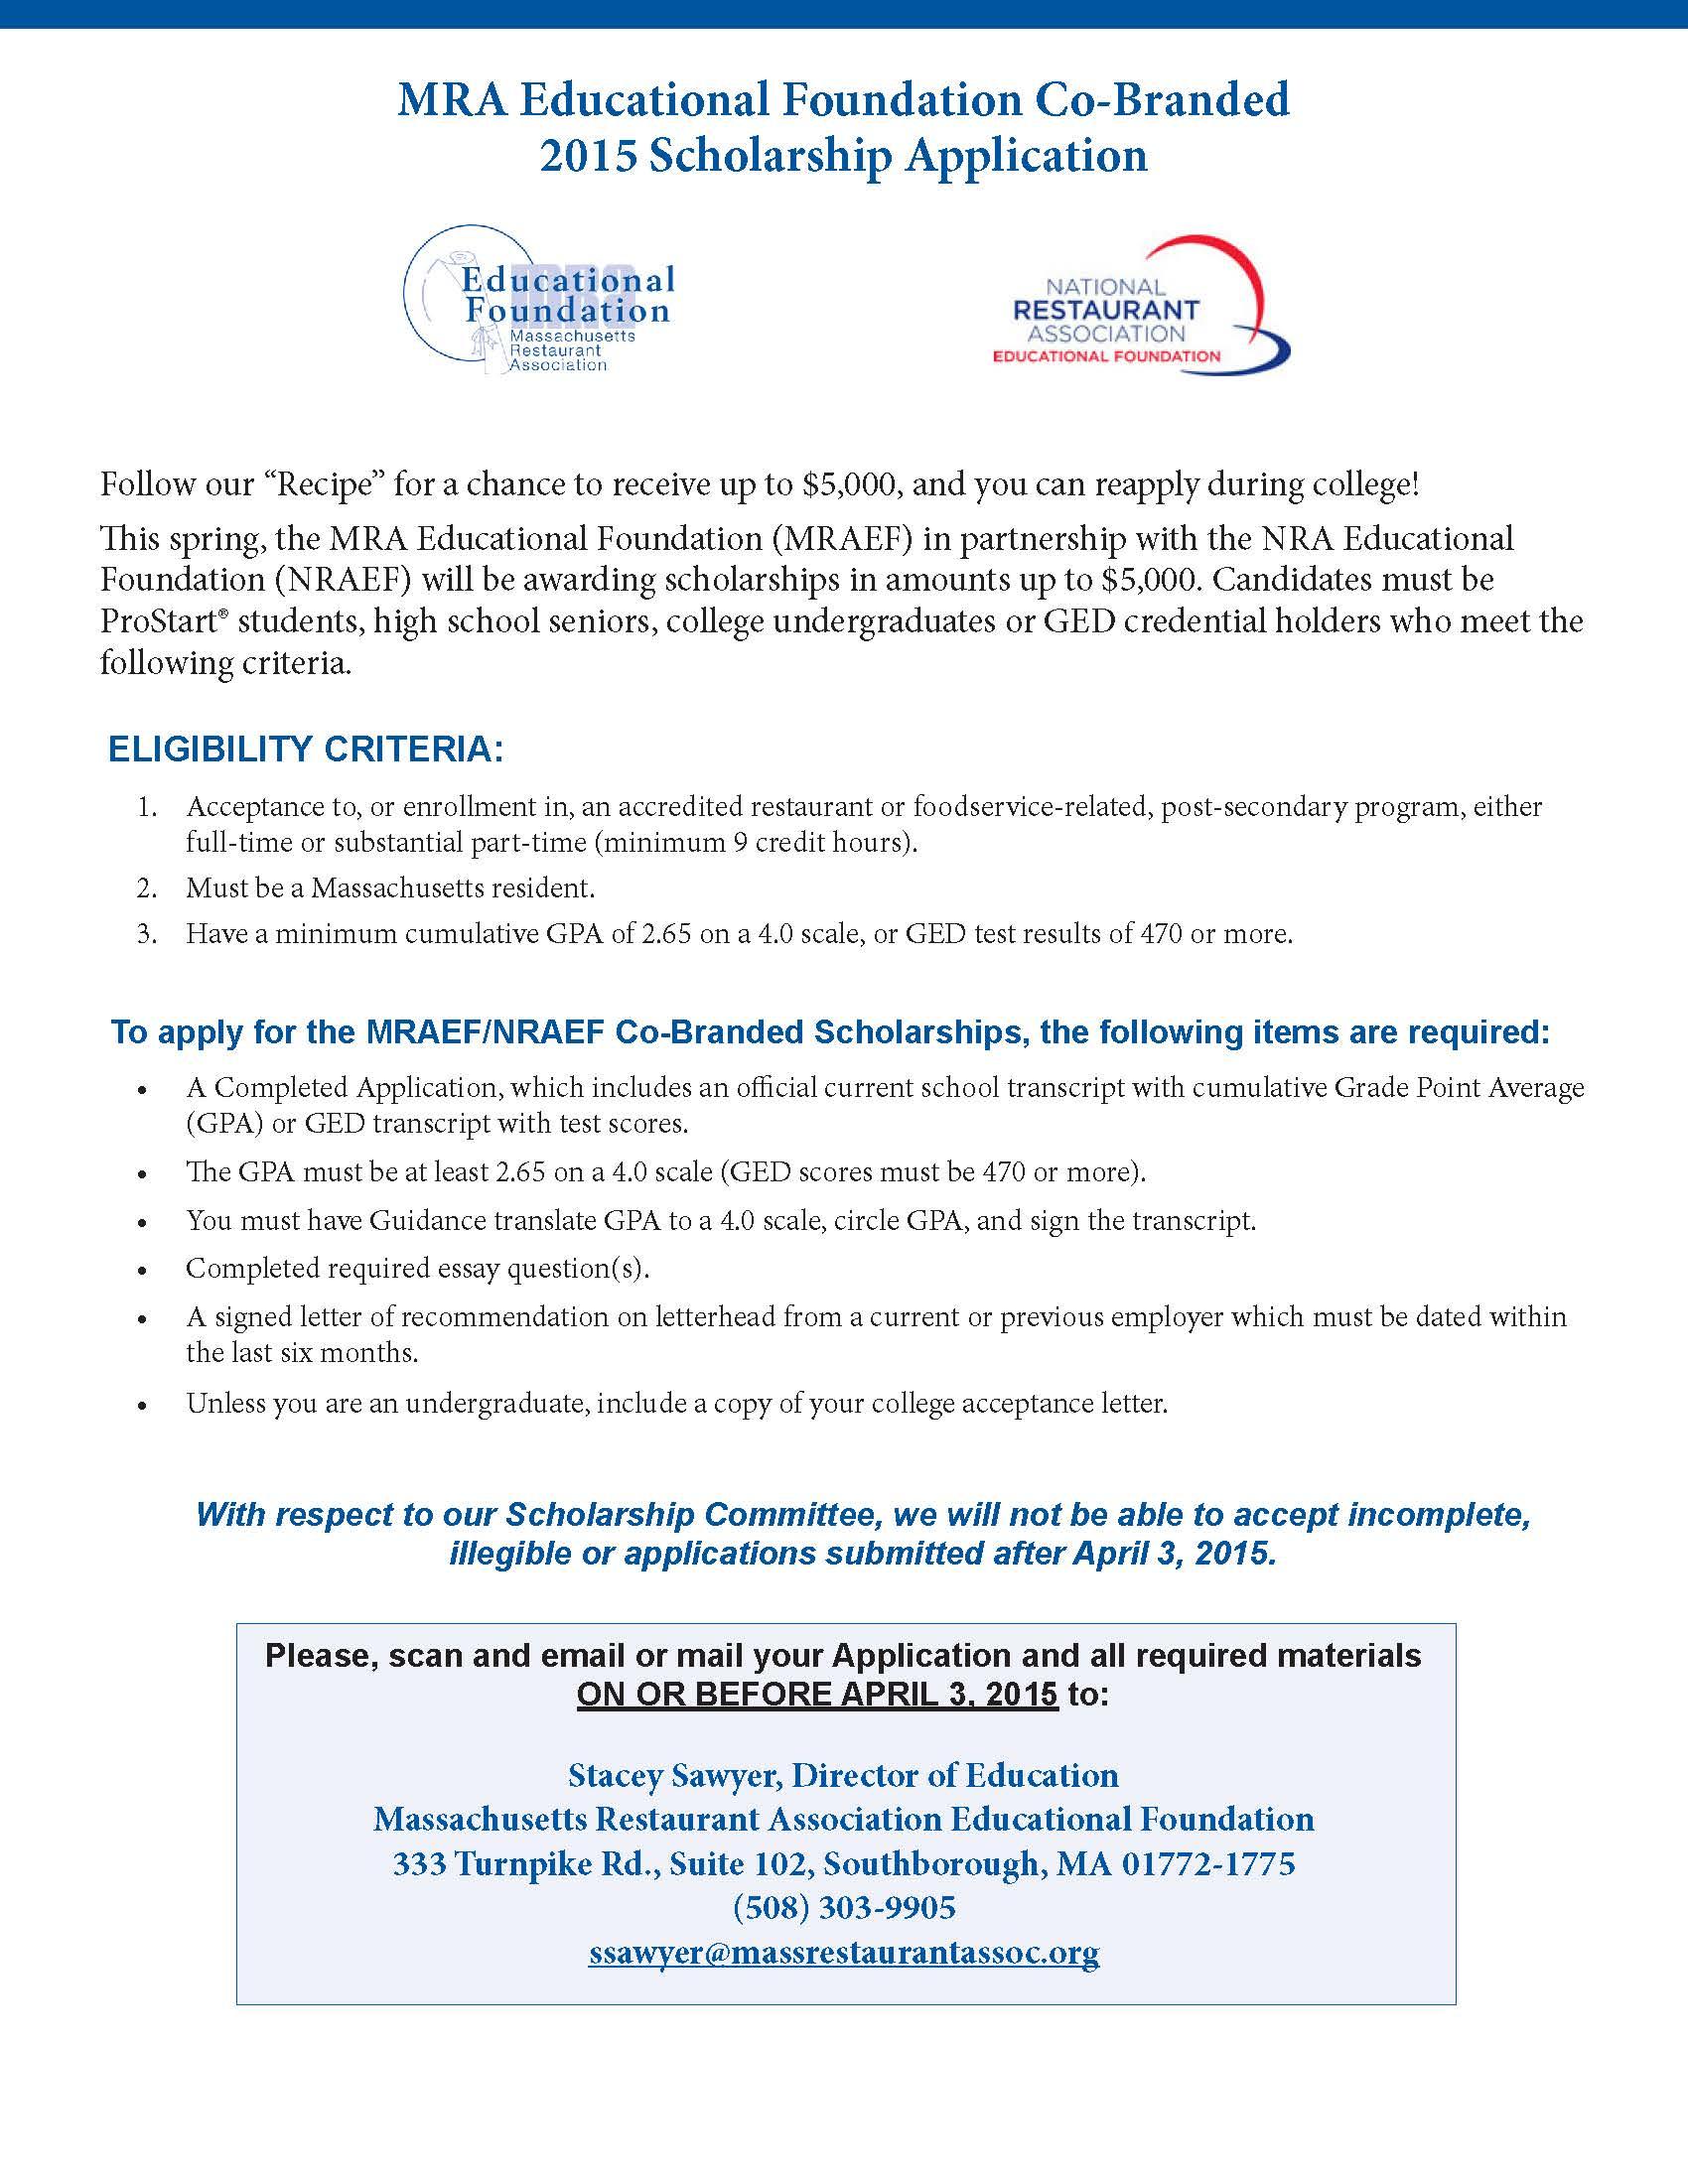 013 No Essay Scholarships For High School Seniors Example Scholarship Application National Restaurant Association Page 1 Rare 2017 2019 Full